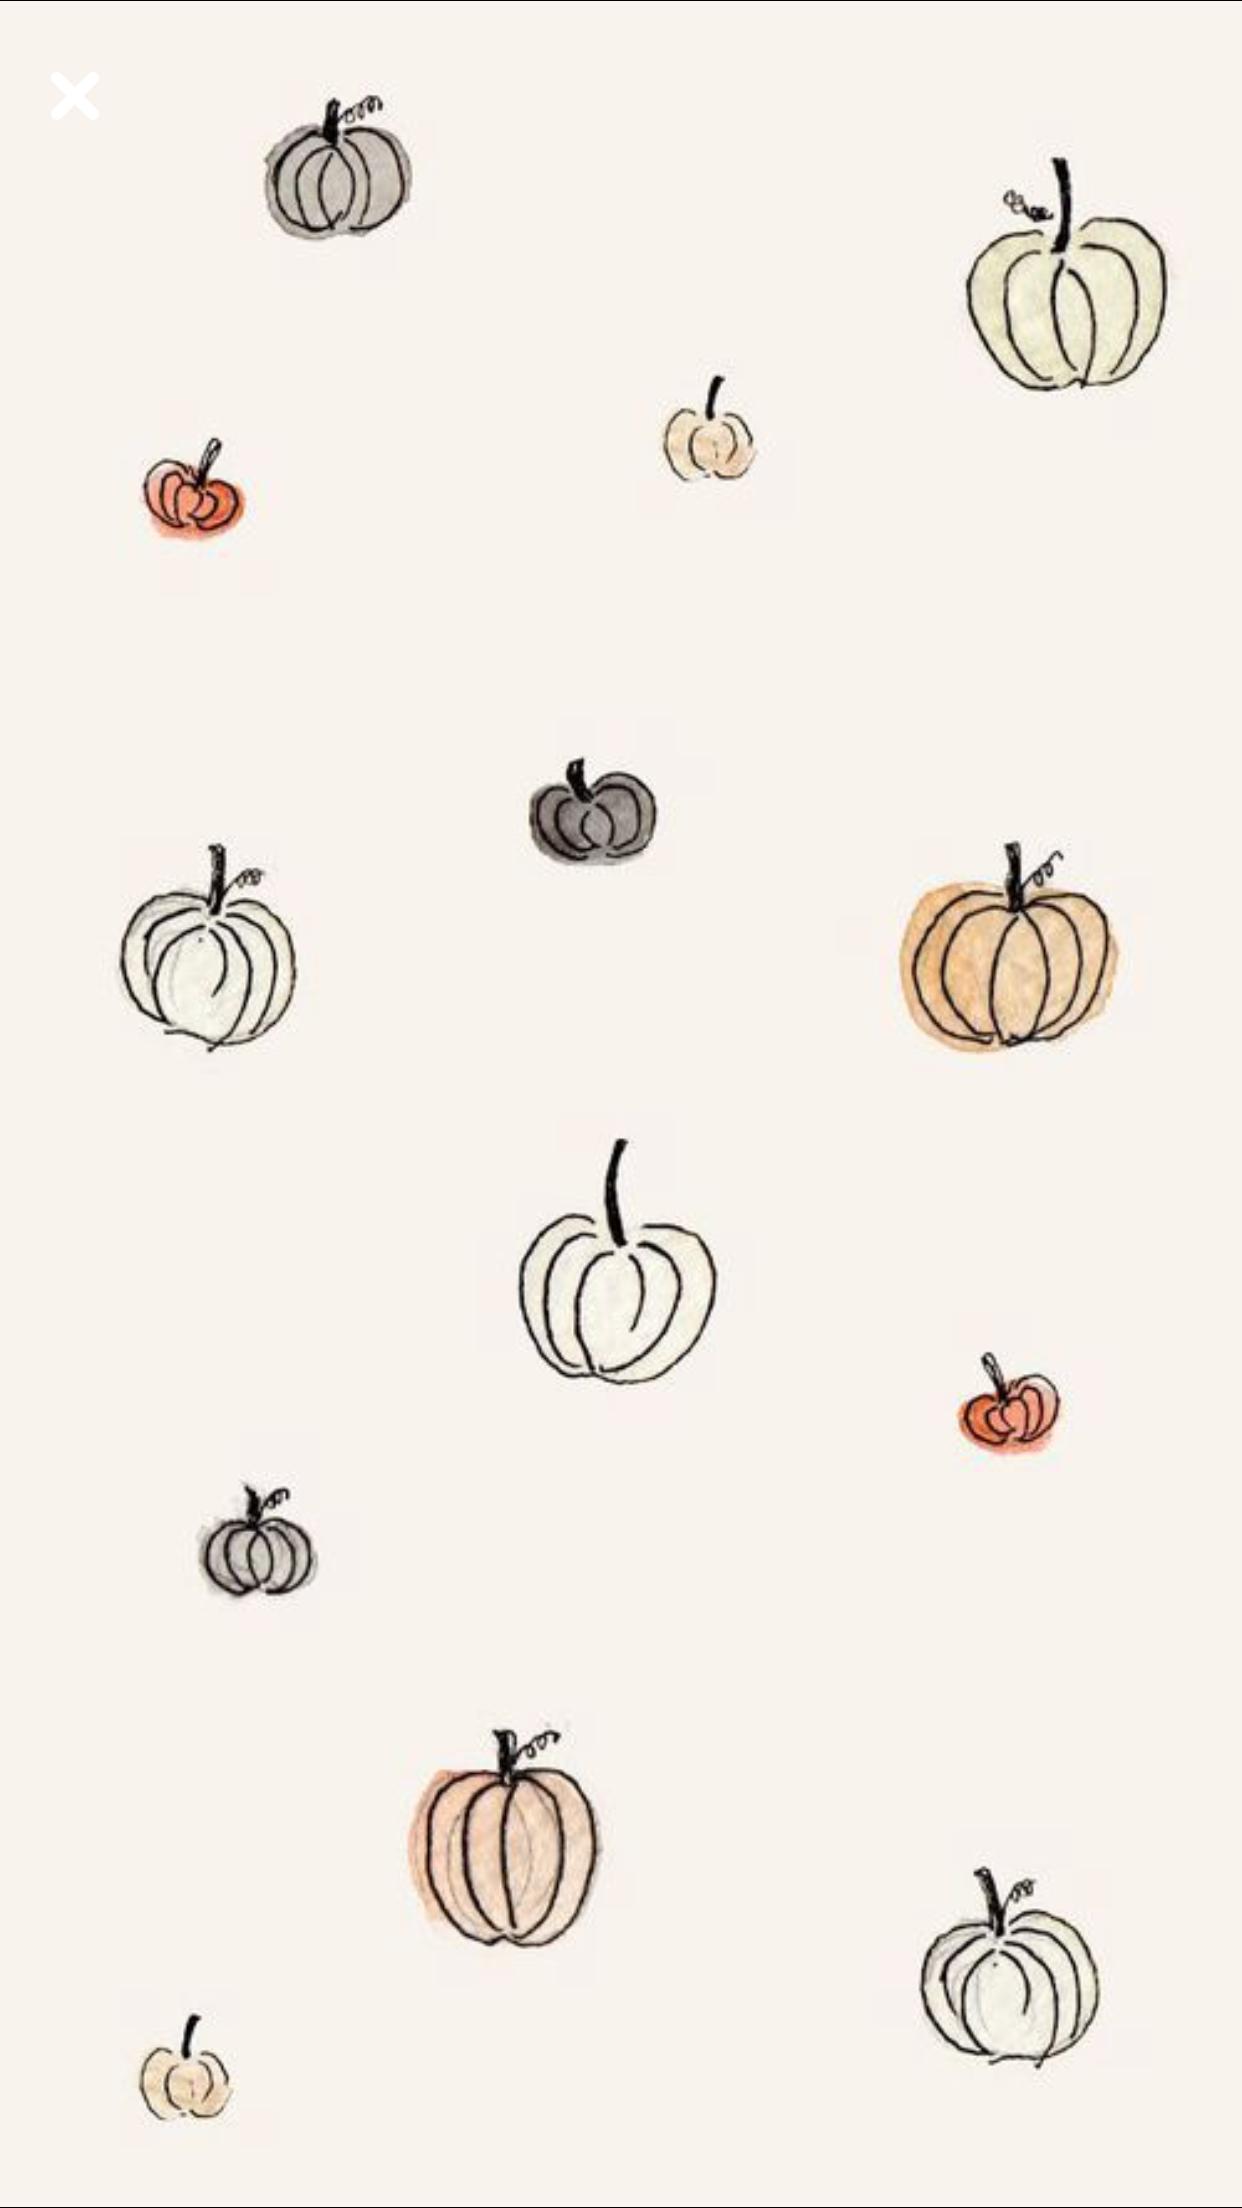 Pin De Megan Hollingshead En Fall Wallpapers Fondos De Halloween